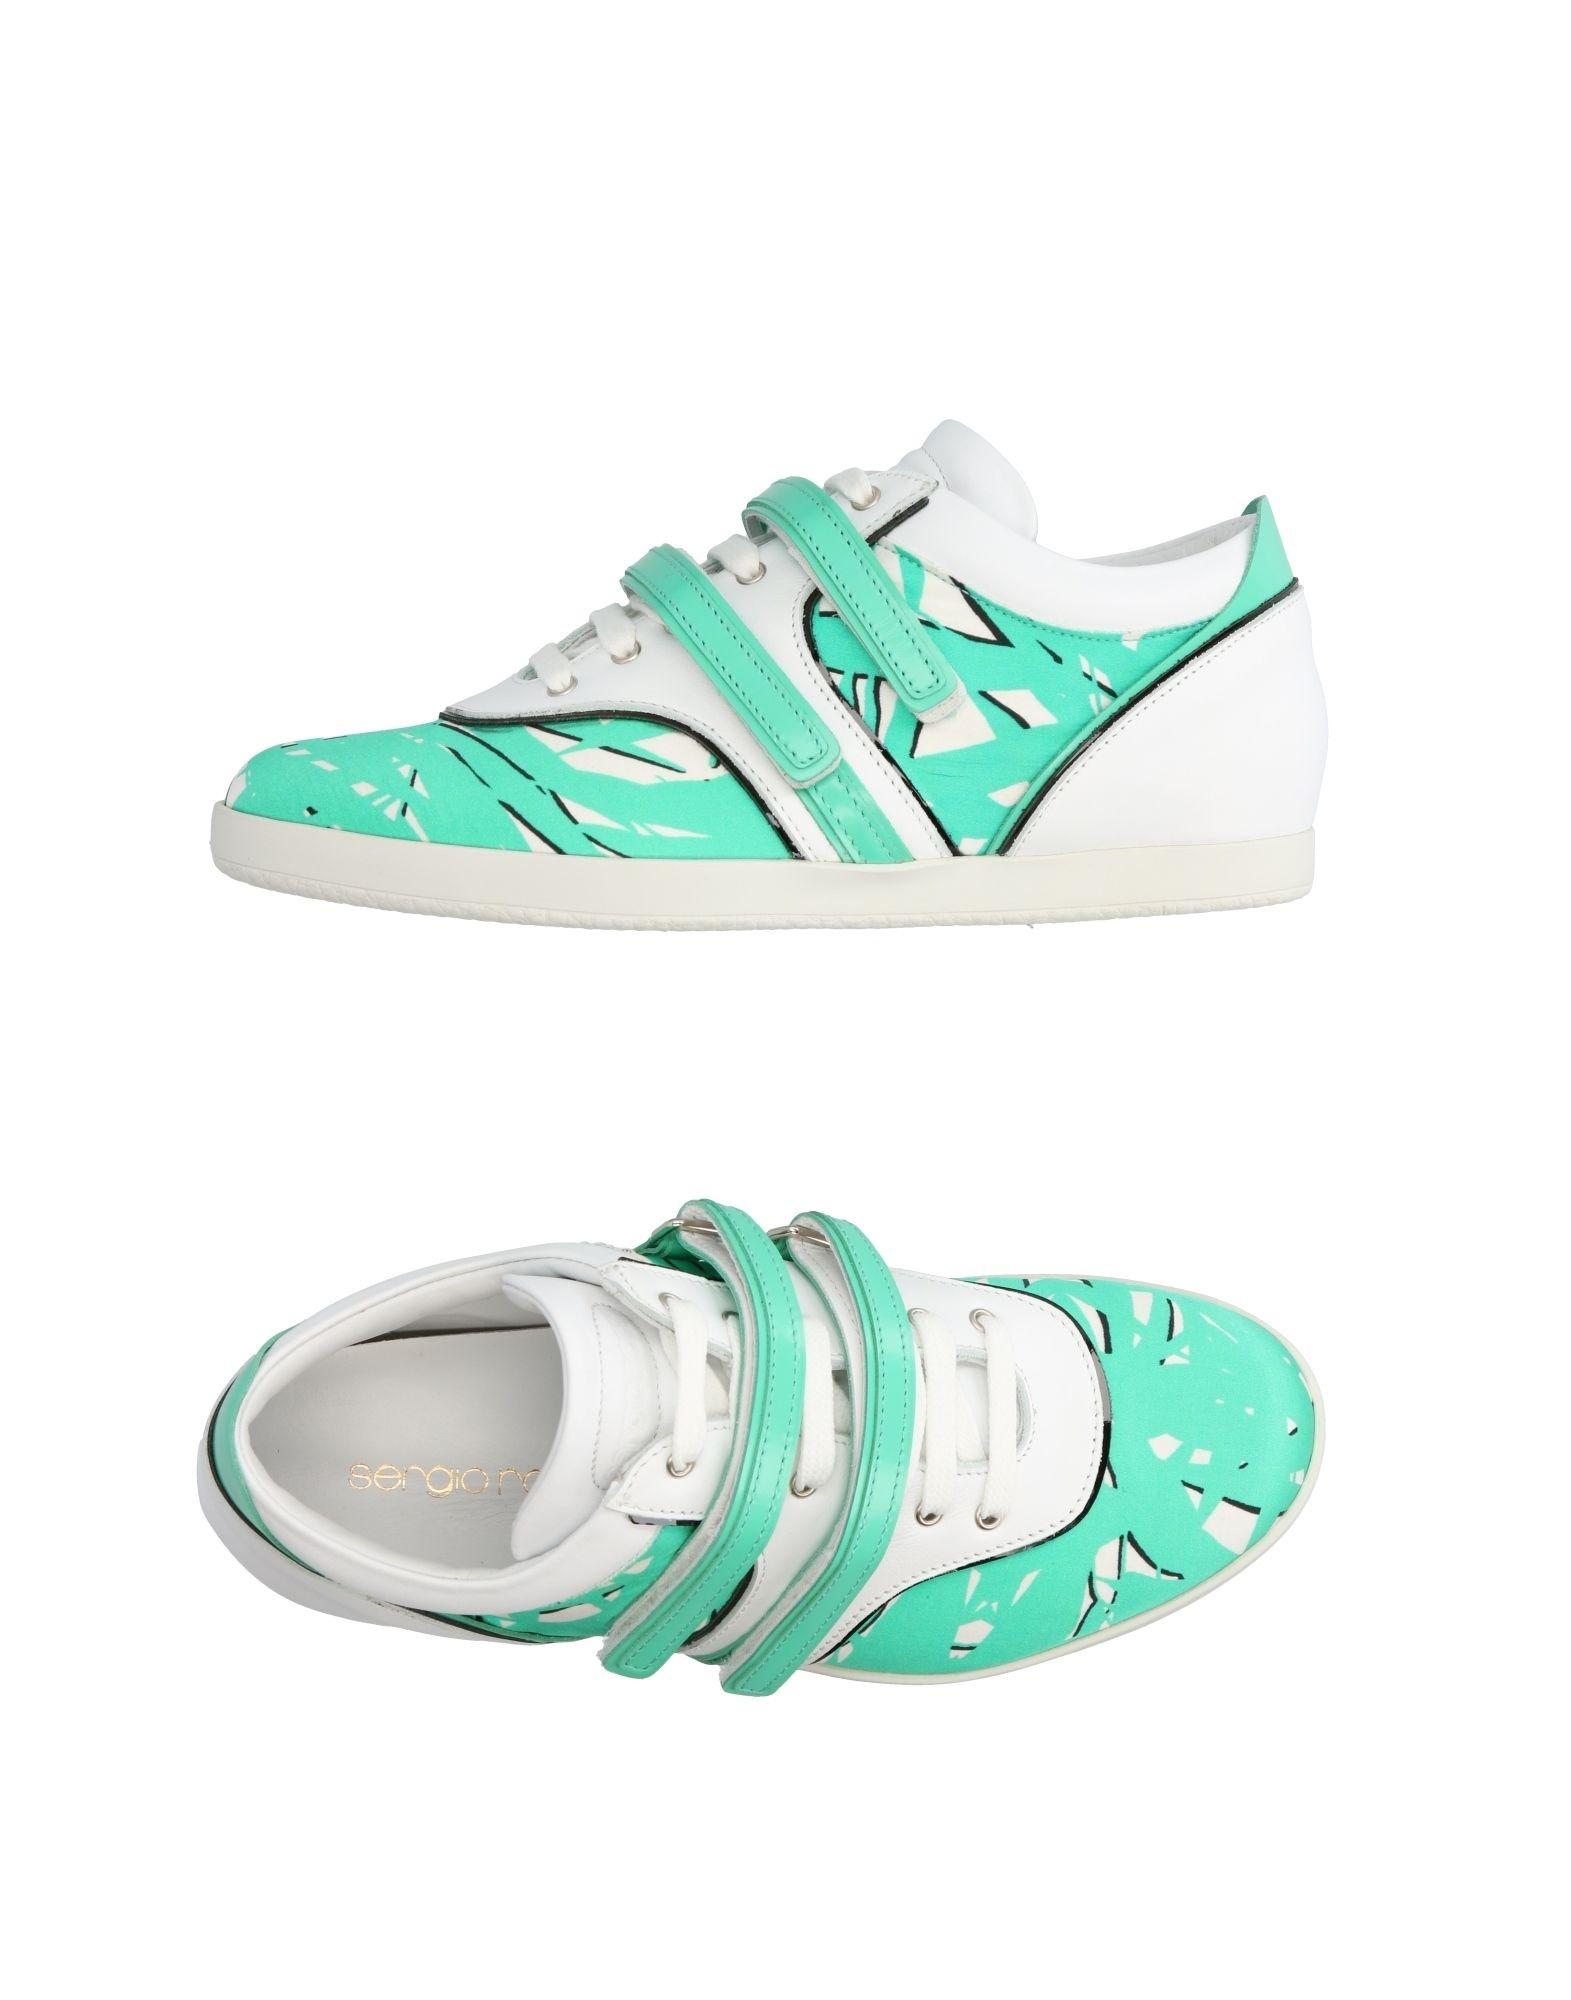 Sergio Rossi Rossi Rossi Sneakers - Women Sergio Rossi Sneakers online on  Canada - 11284728DR 9311b6